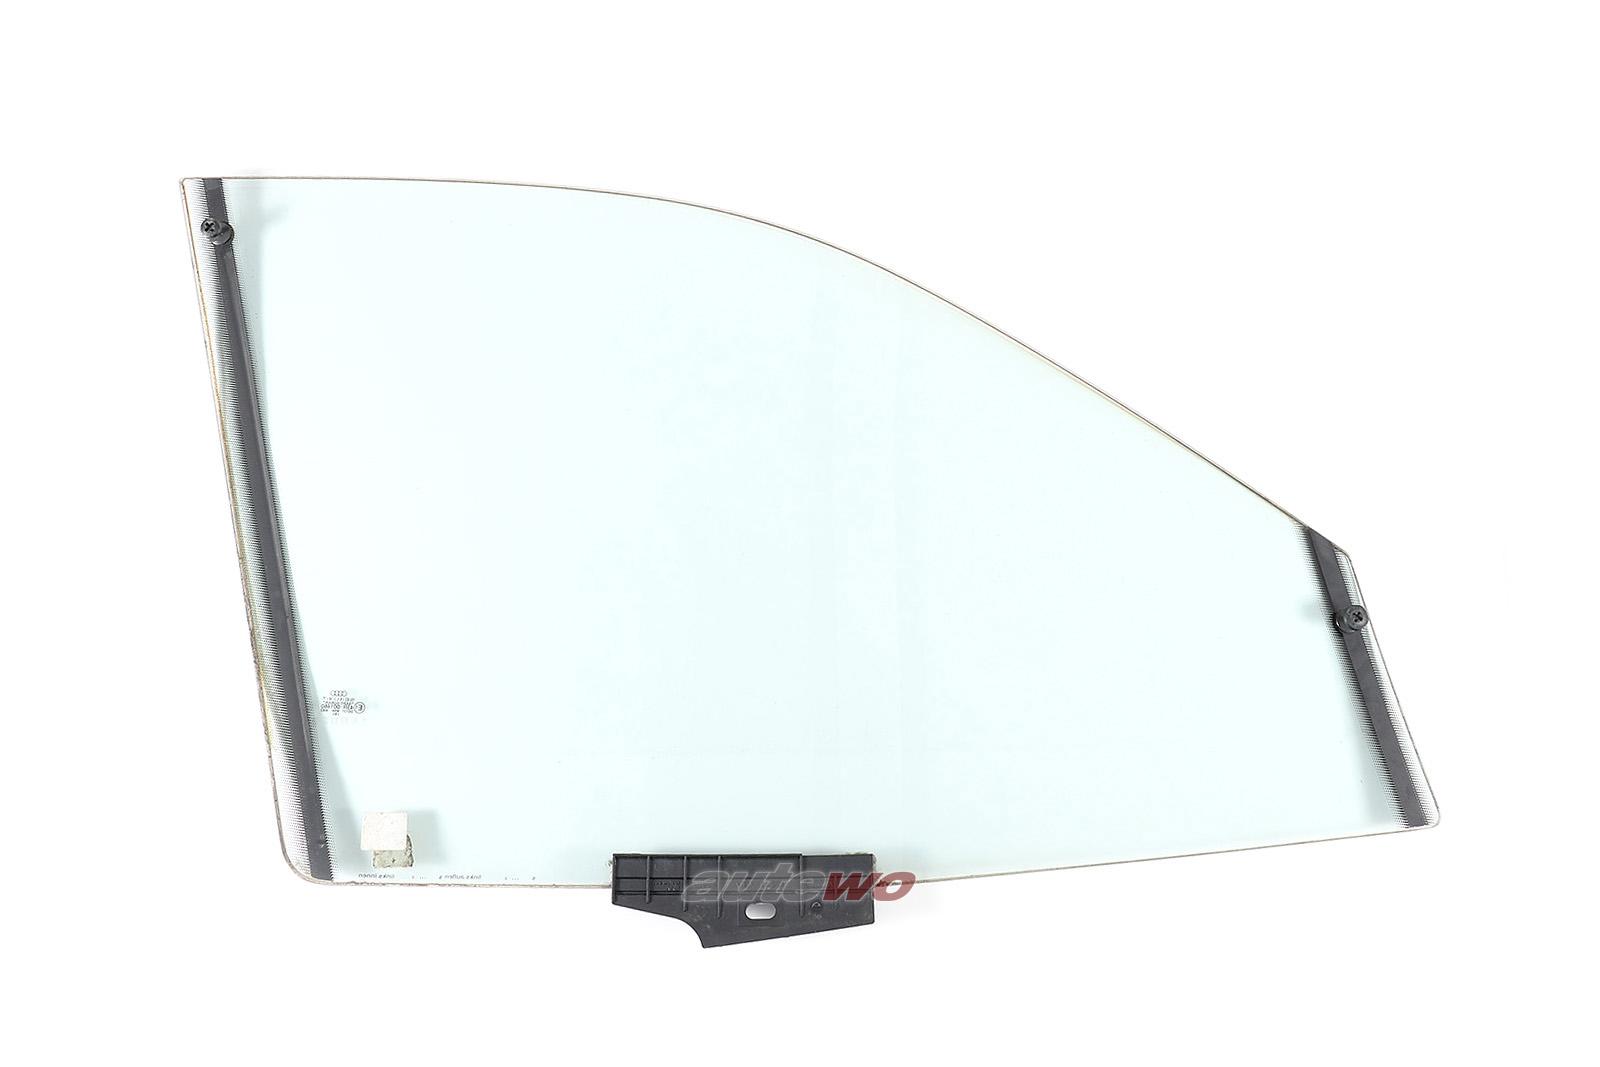 4d C Audi A8 S8 D2 Seitenscheibe Verbunddammglas